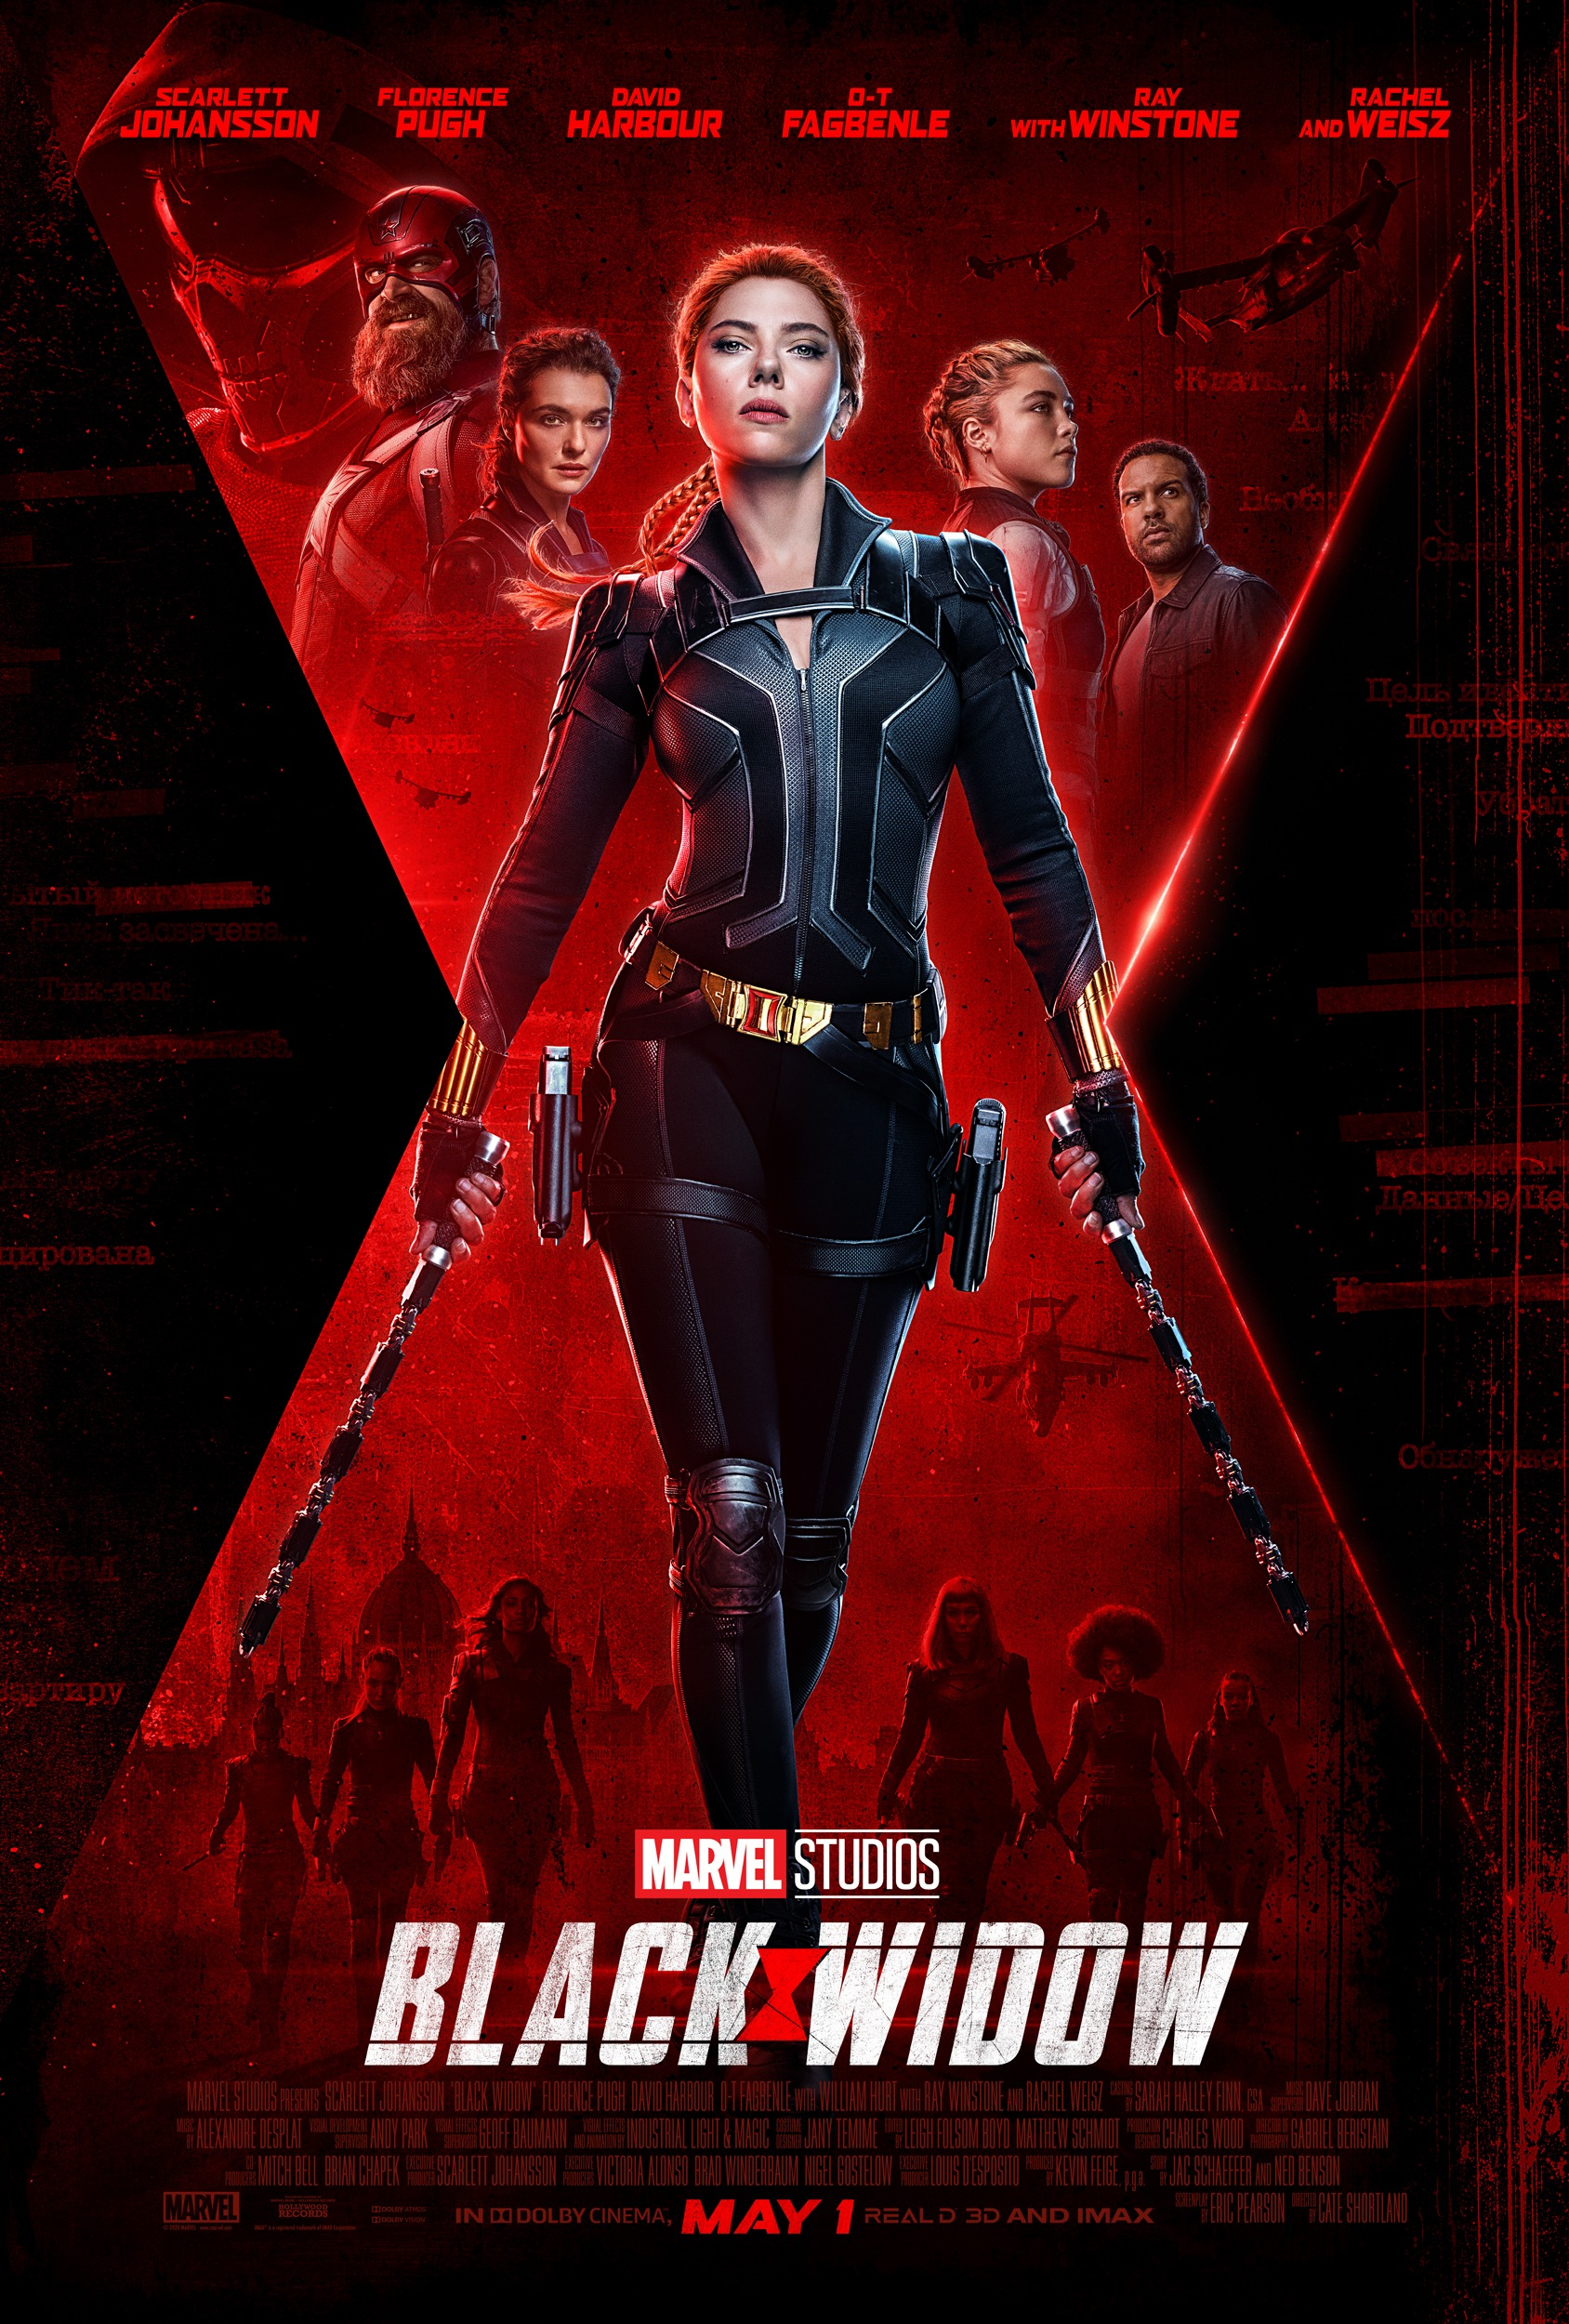 Black Widow Movie Poster Marvel Cinematic Universe Portrait Display Movies Women Scarlett Johansson 1688x2500